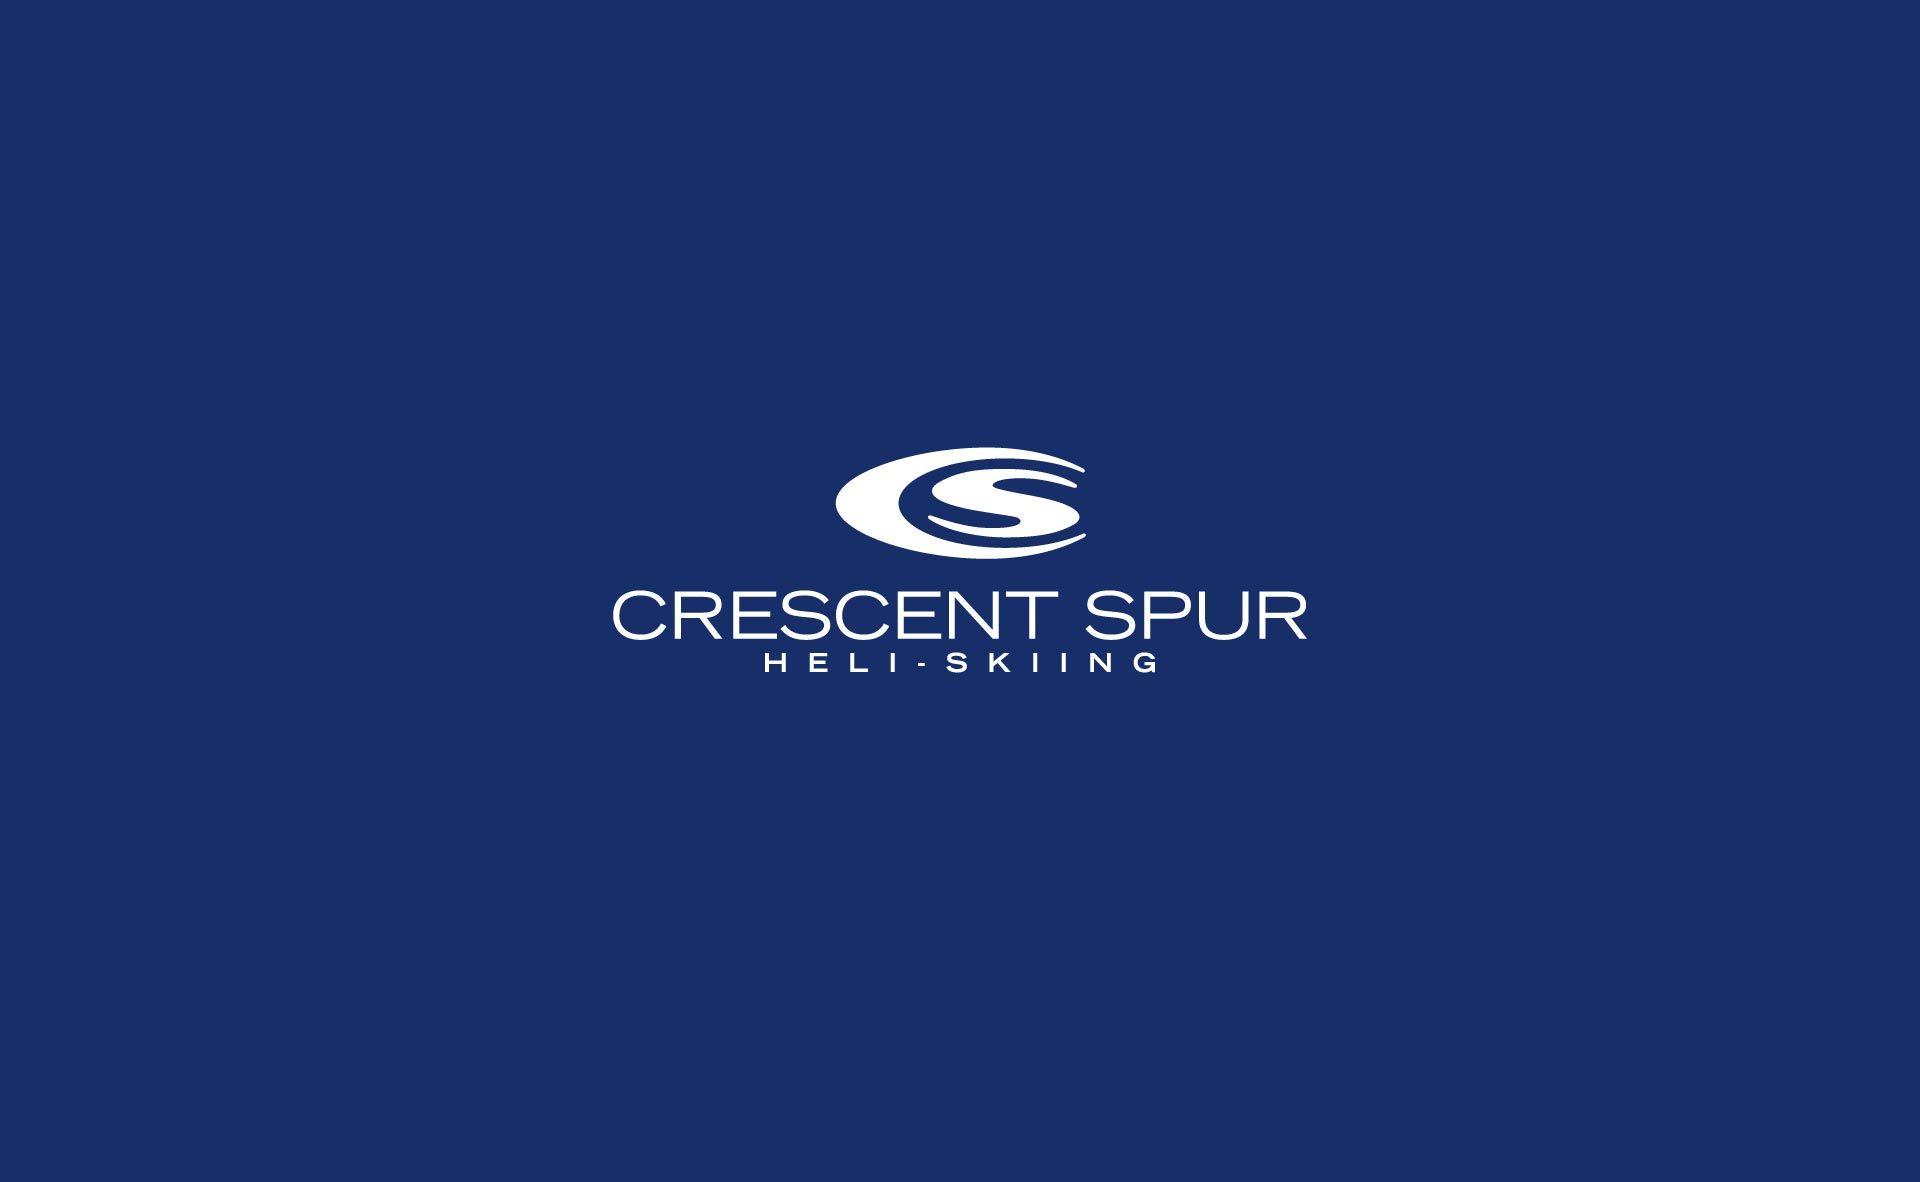 Crescent Spur